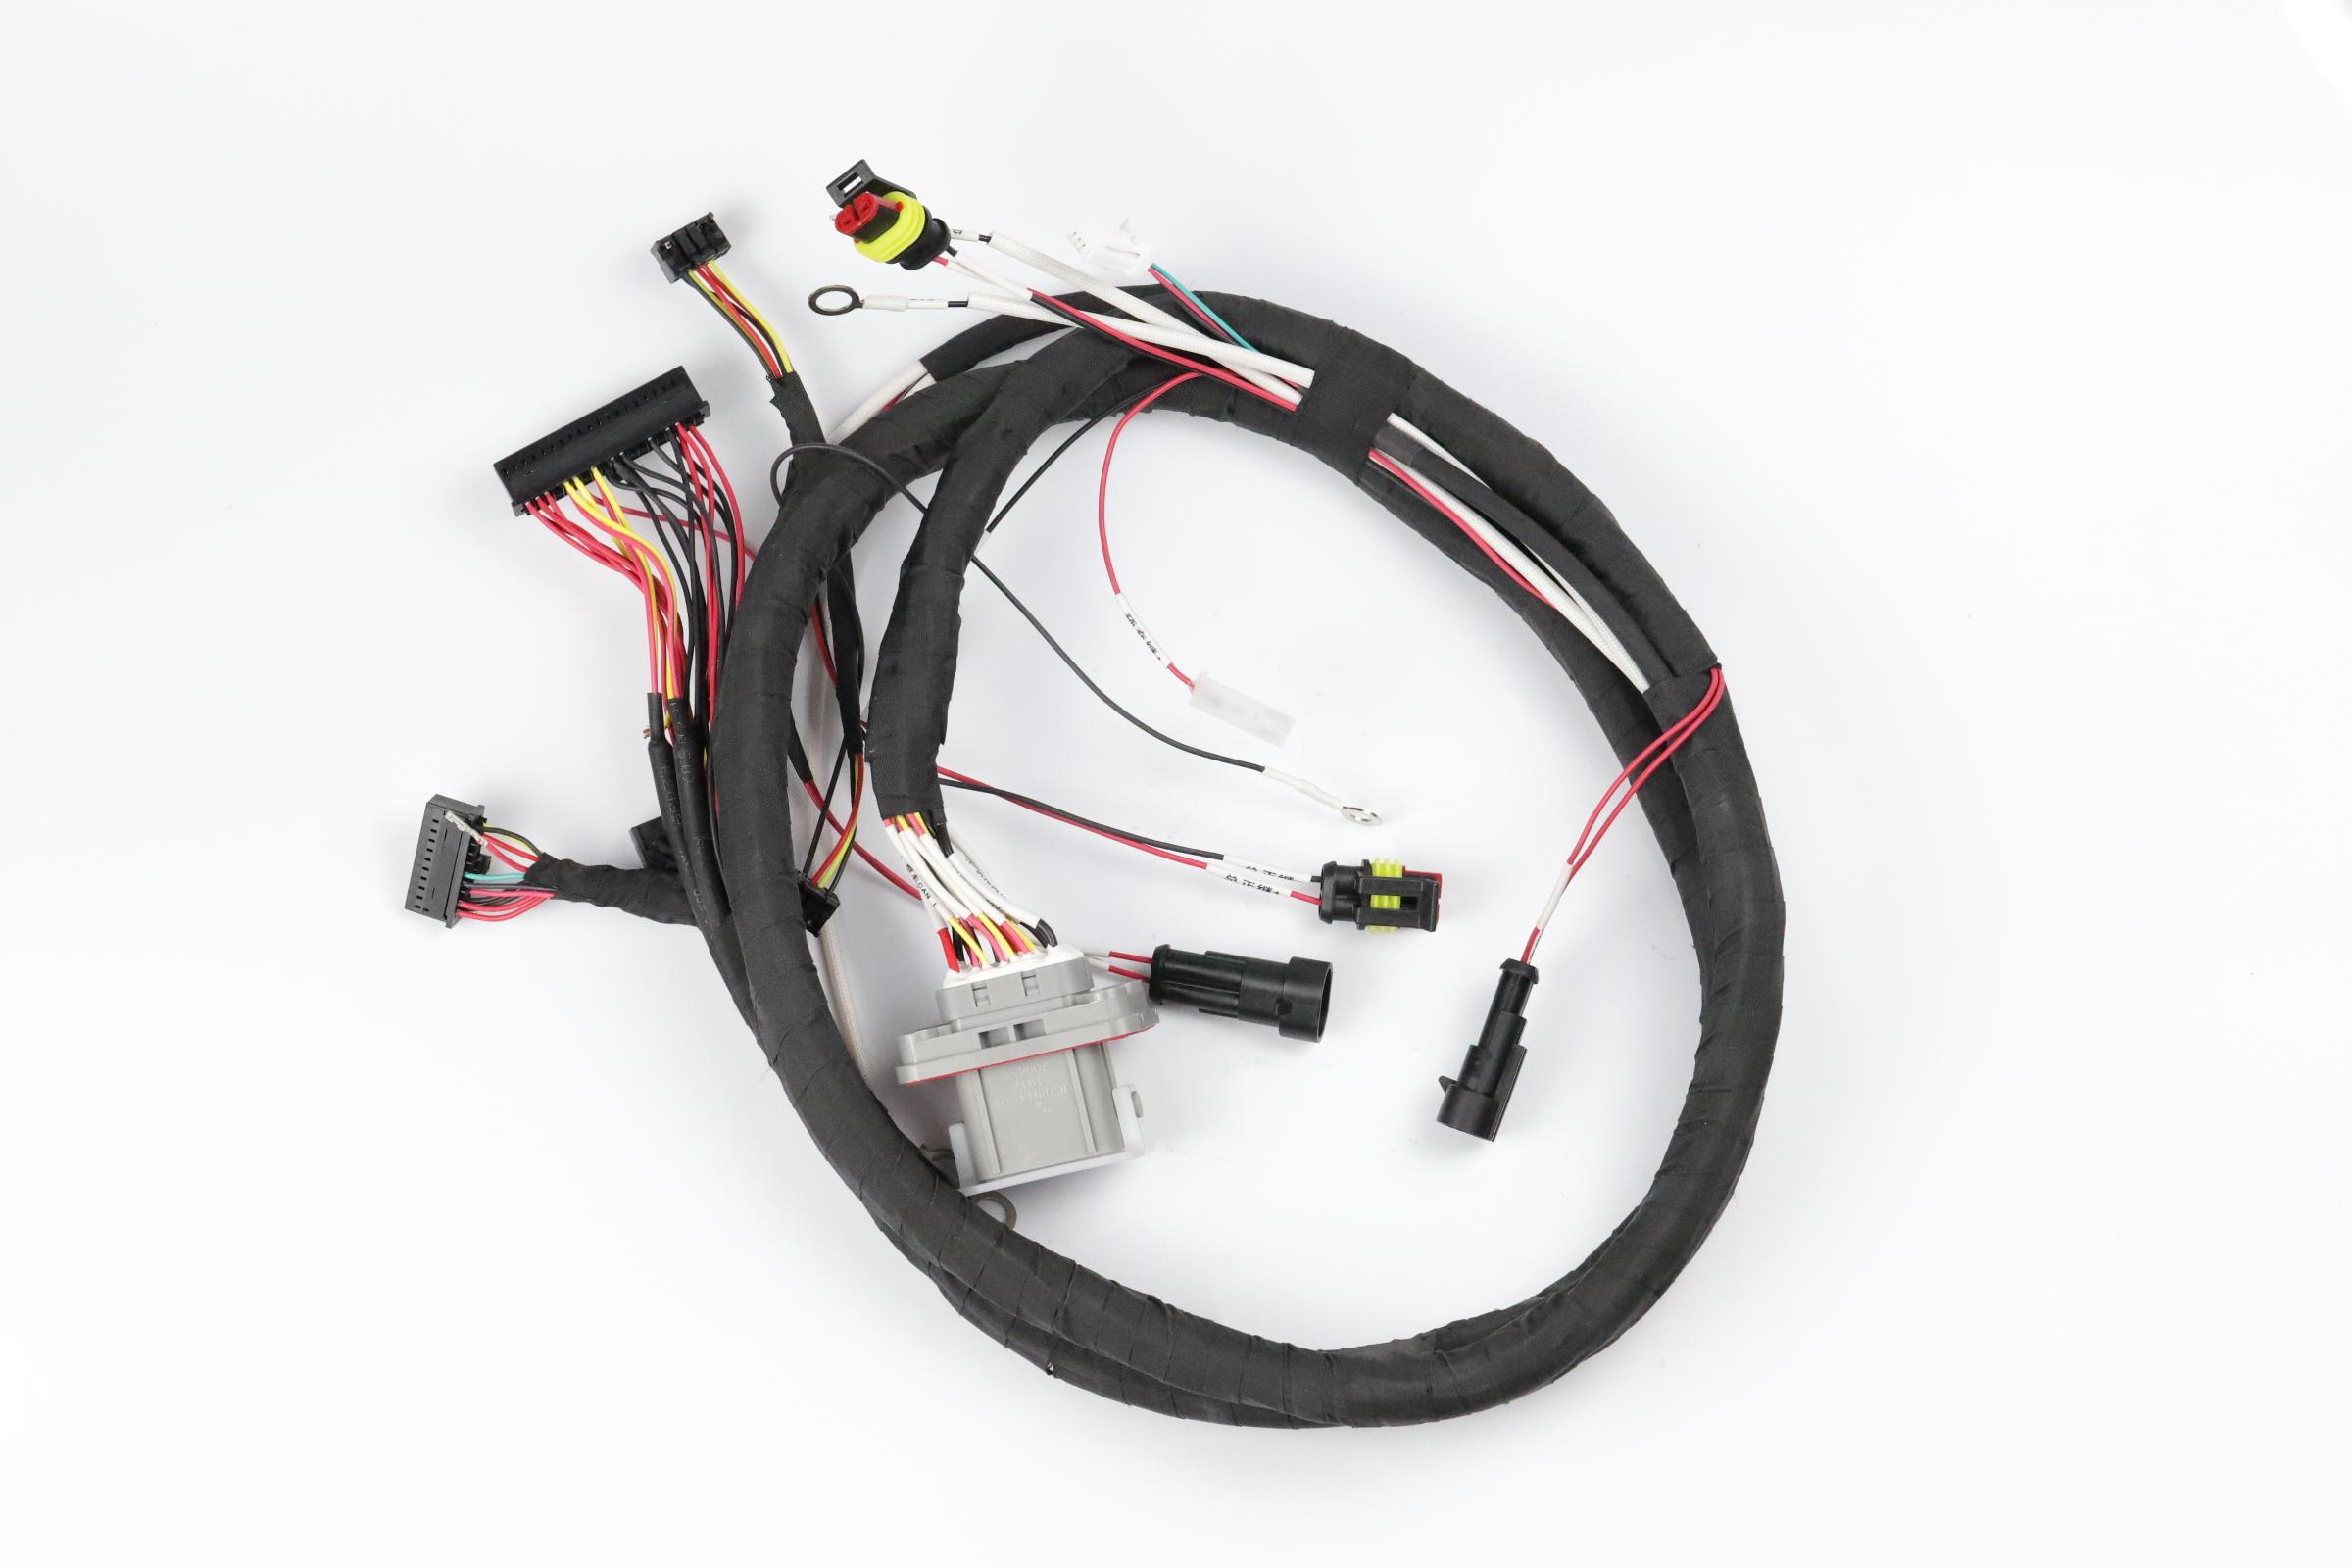 RCD-MC791 电动汽车箱低压线束 汽车线束定制加工生产厂家